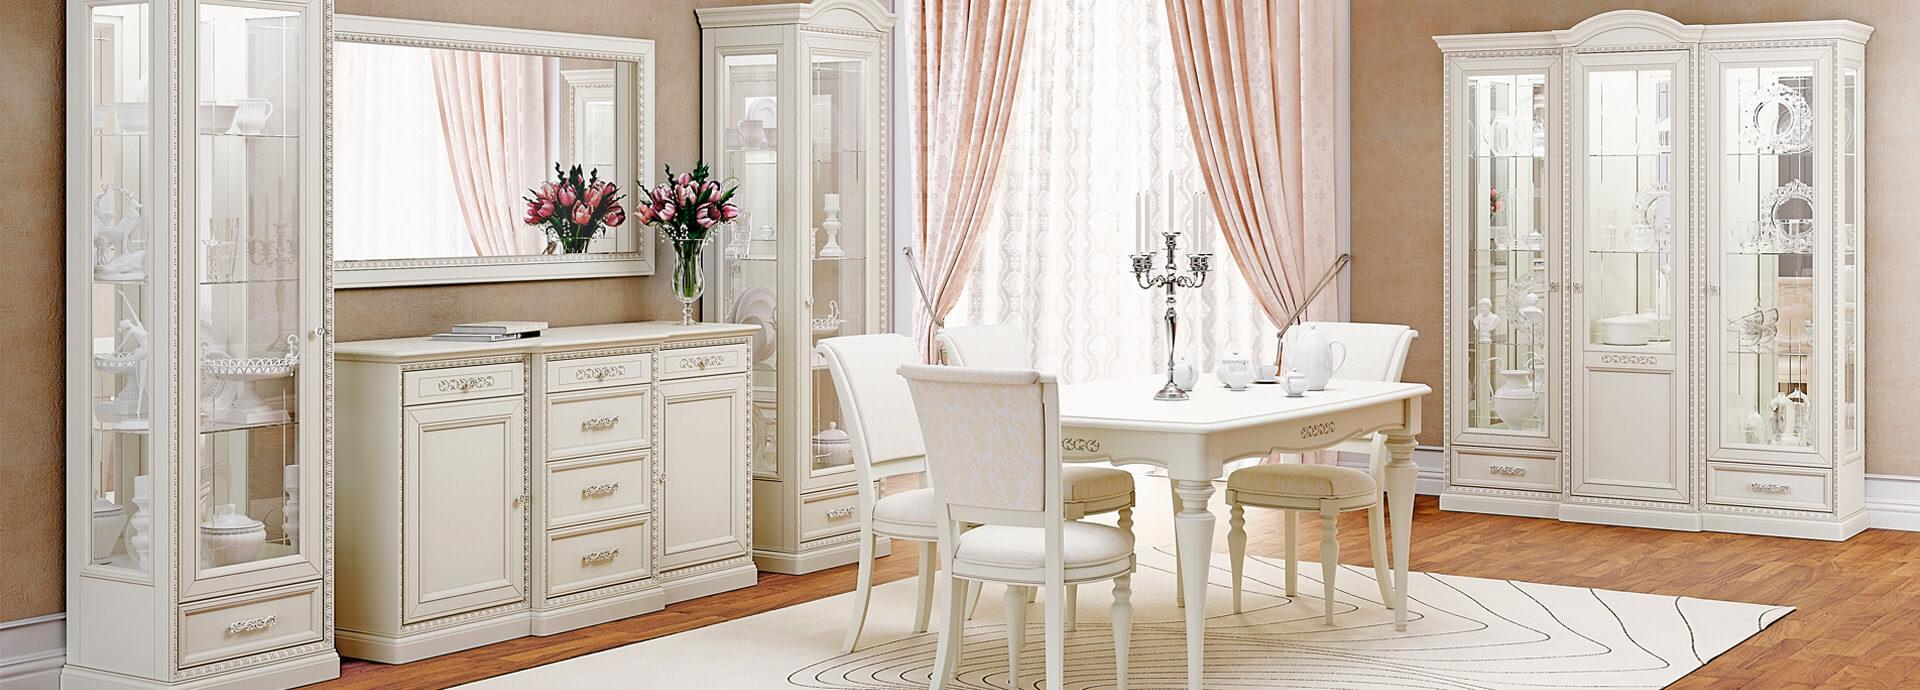 Venezia Living room